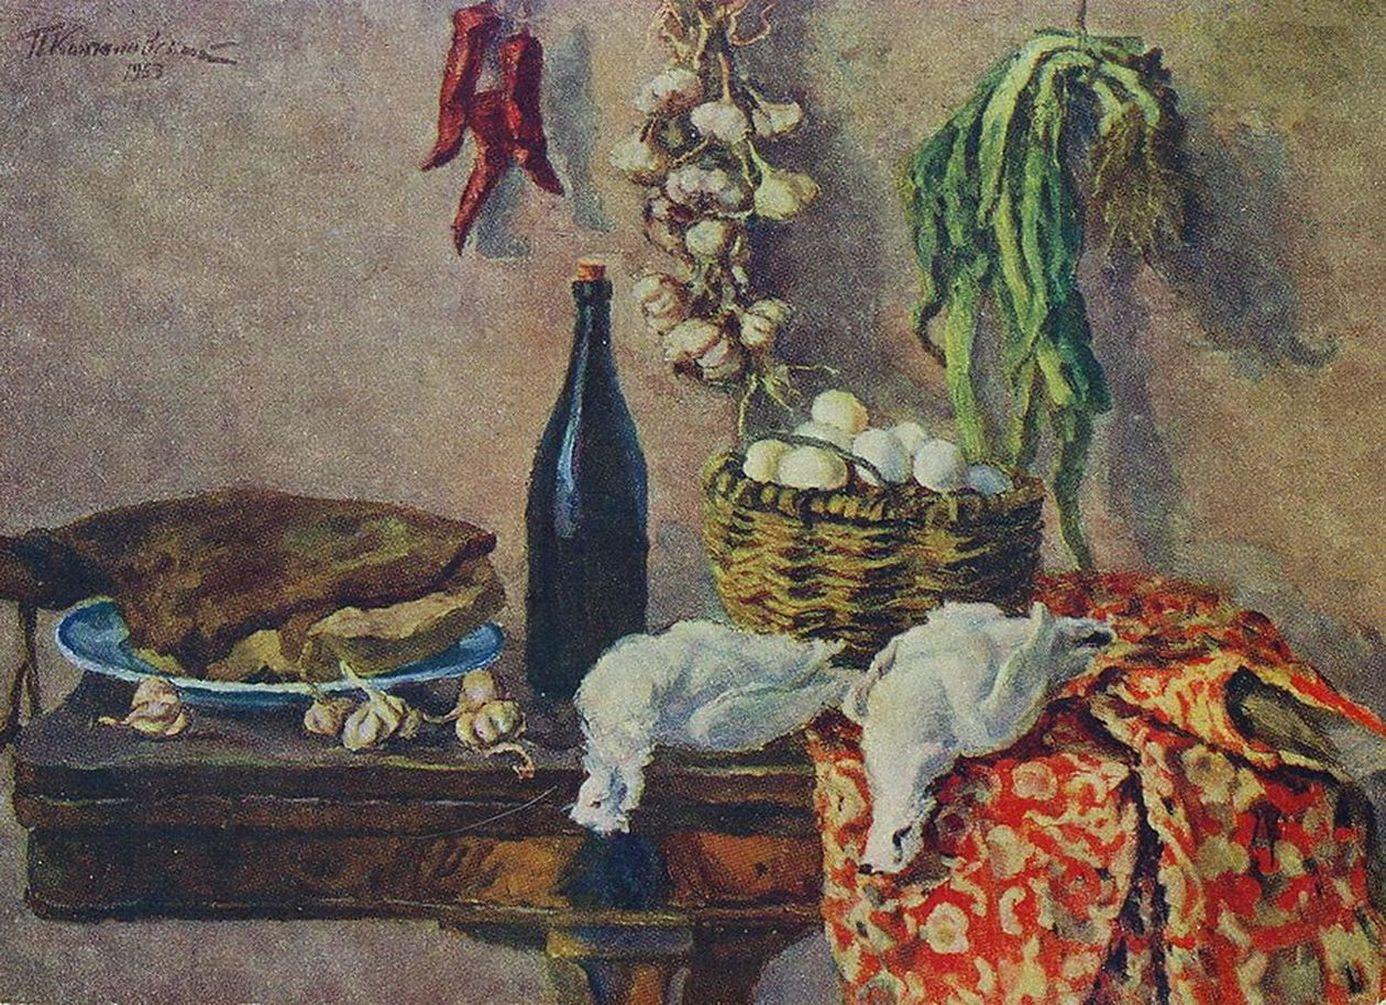 Петр Кончаловский. Натюрморт. Белые куропатки. 1953